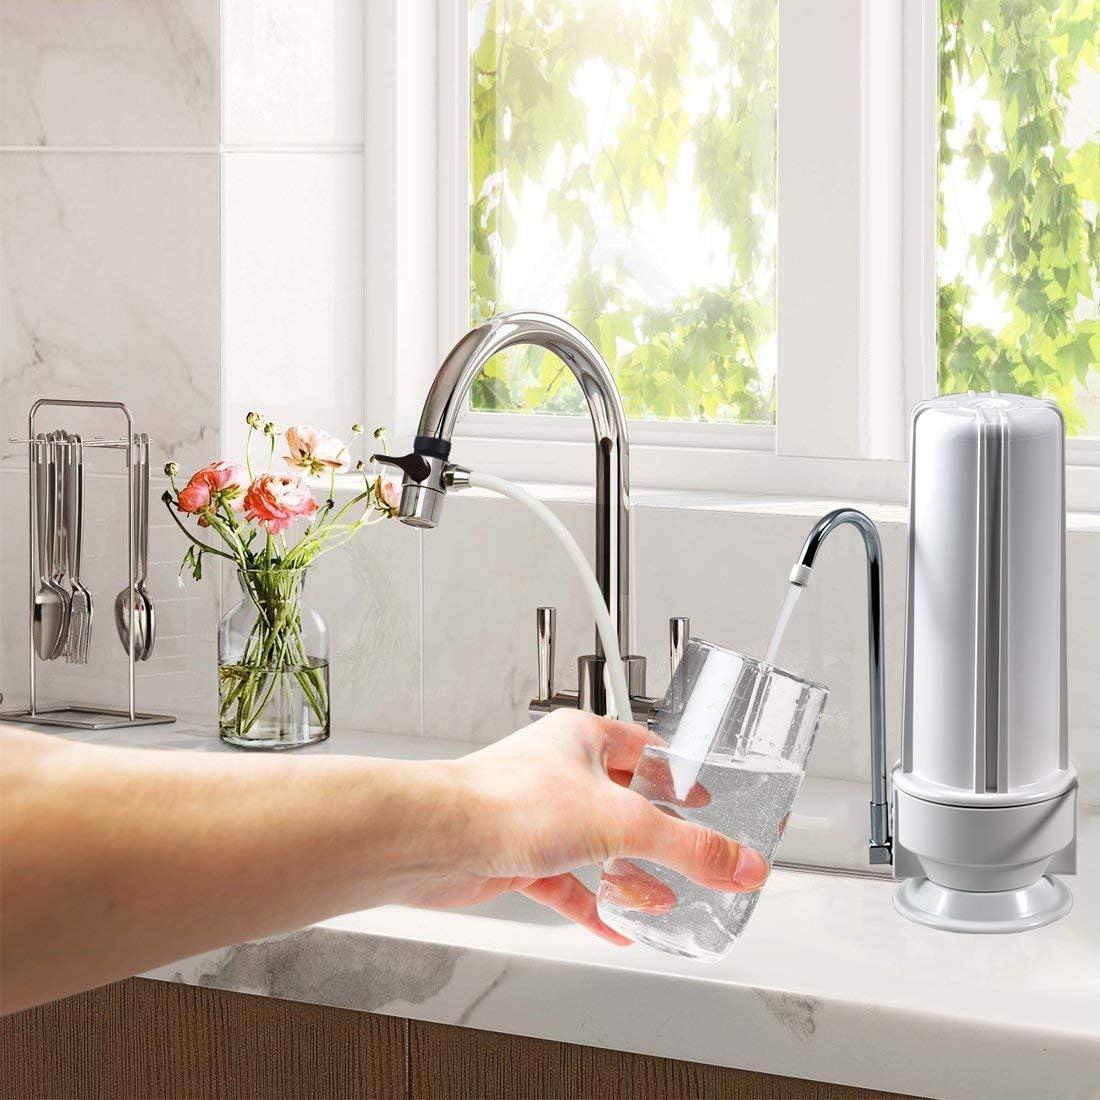 NU Aqua Premium Countertop Water Filter compact size